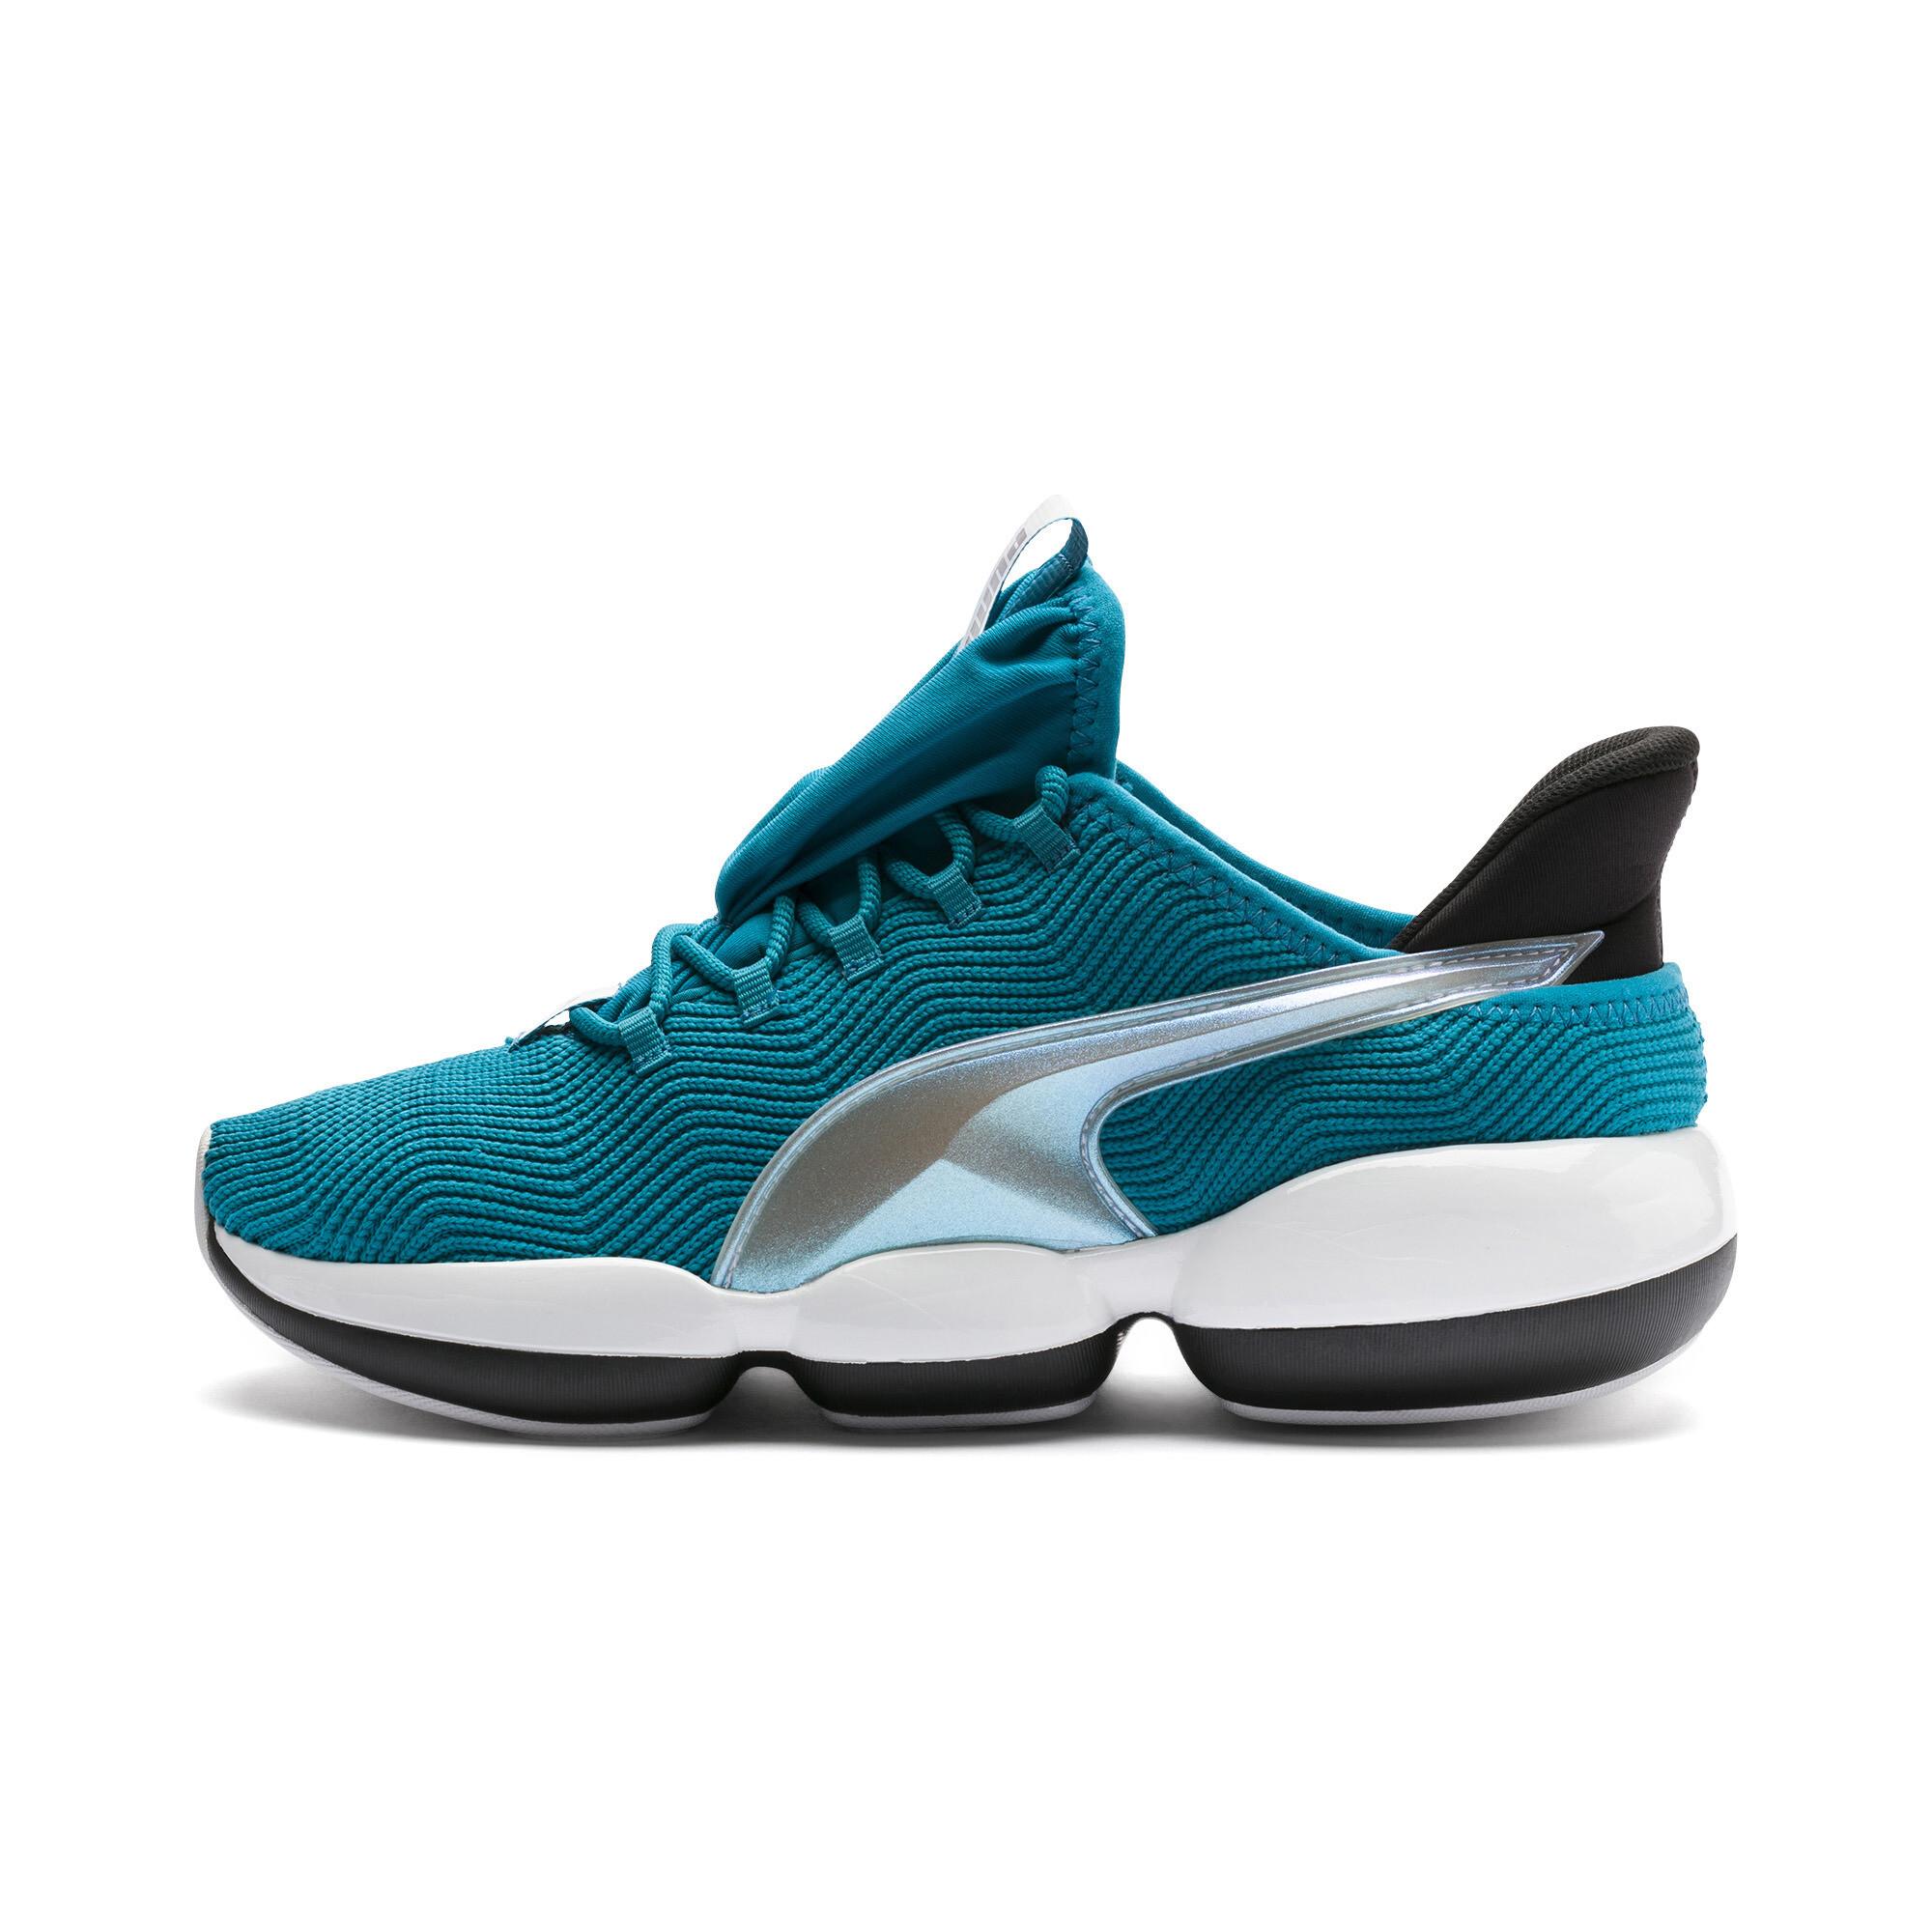 Image Puma Mode XT Iridescent Trailblazer Women's Sneakers #1